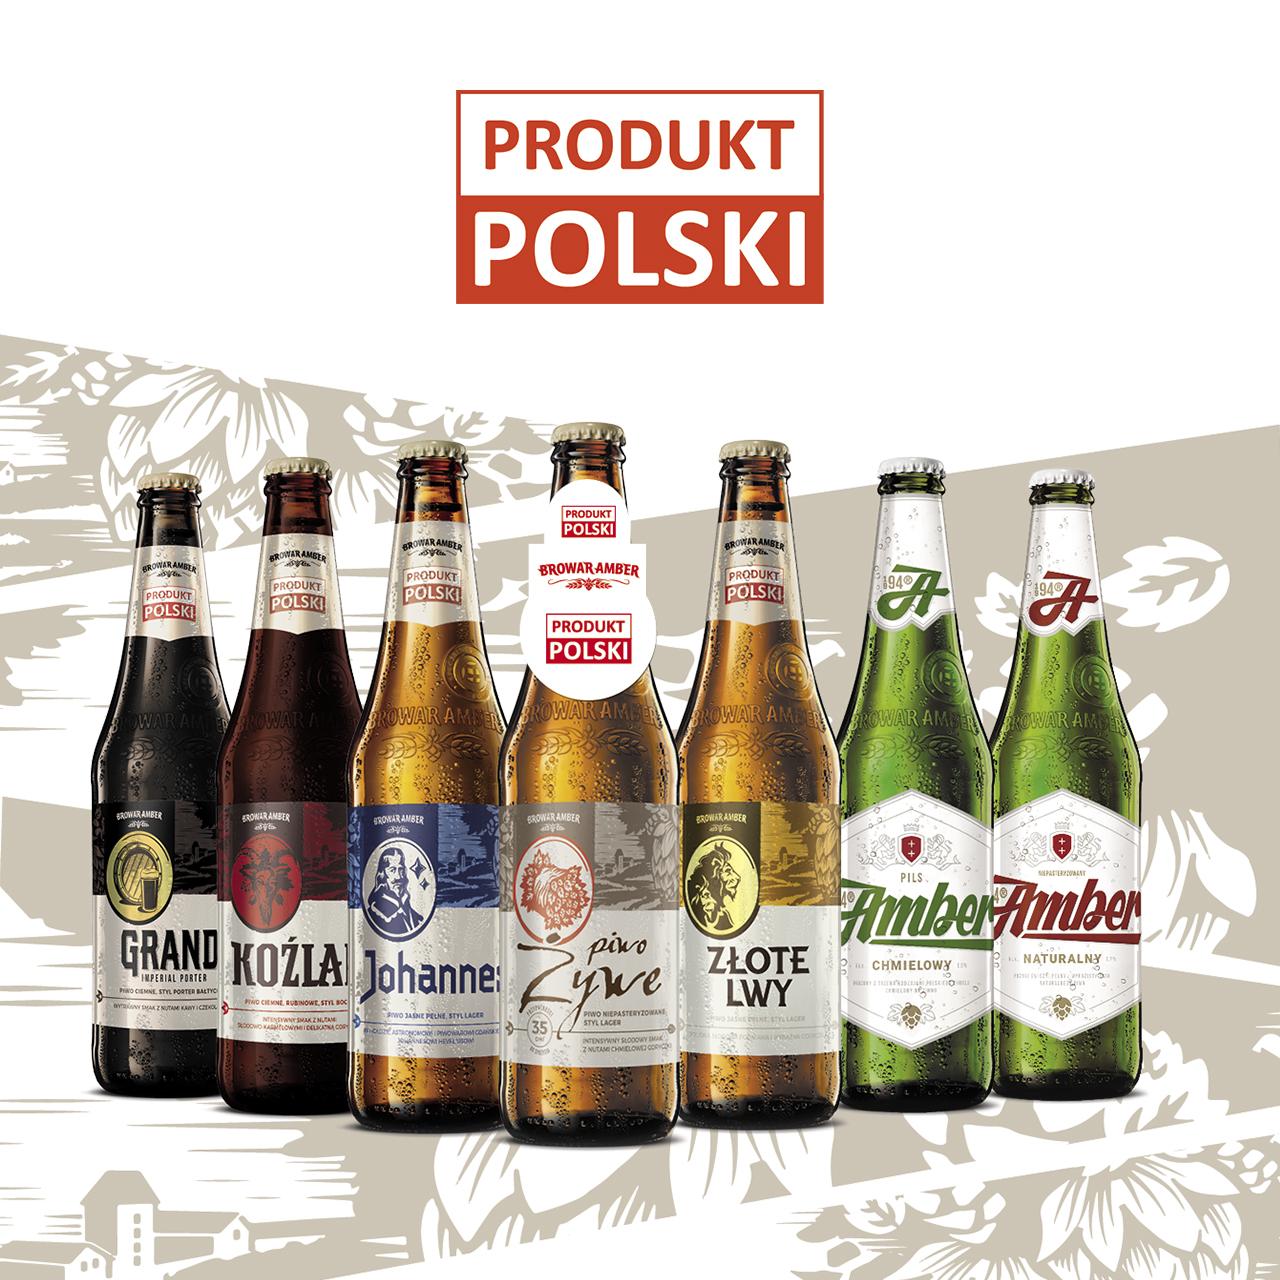 Produkt_polski_biuro_prasowe